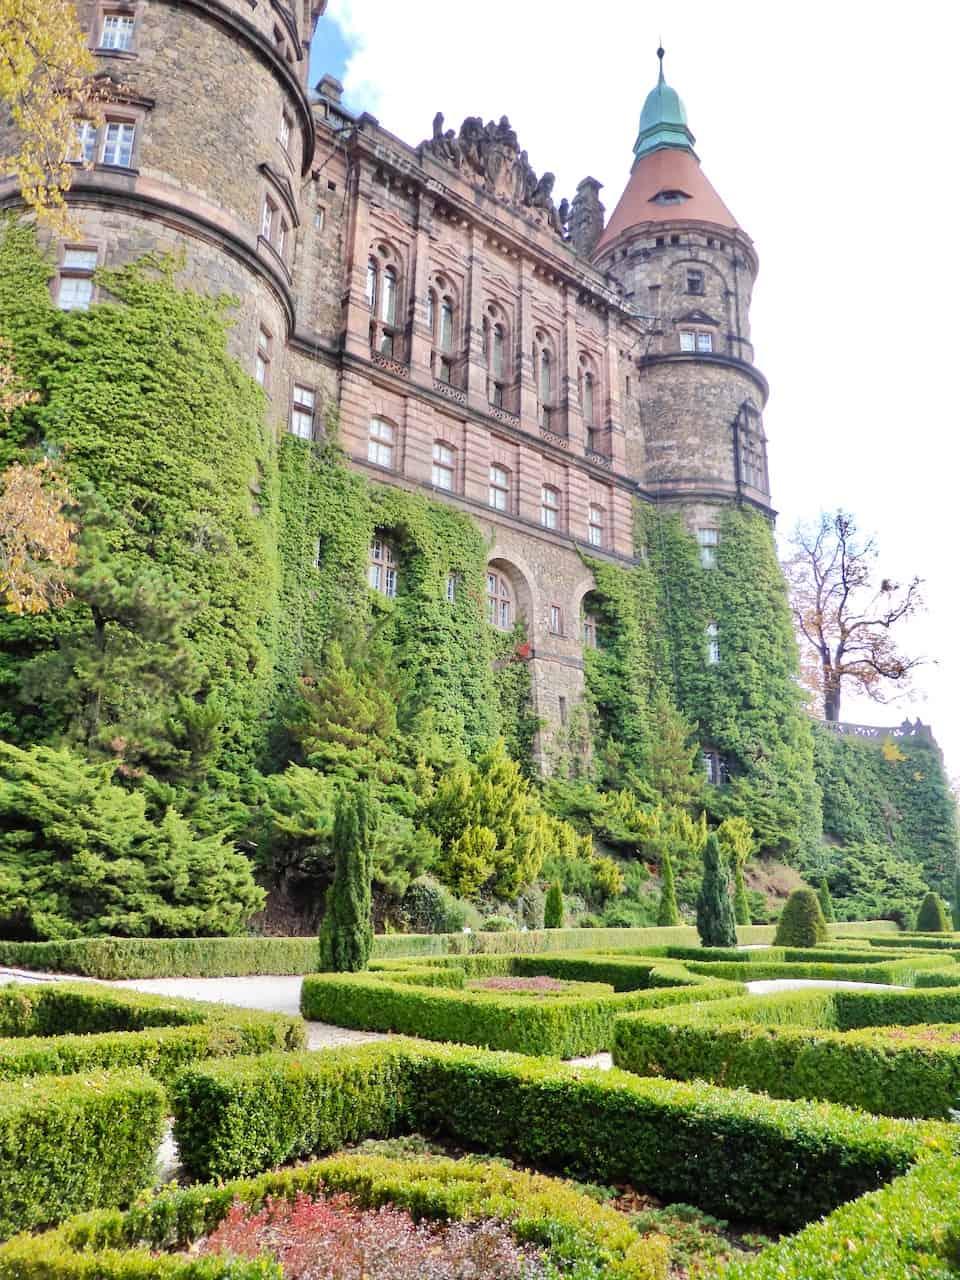 ksiaz-castle-gardens-photo